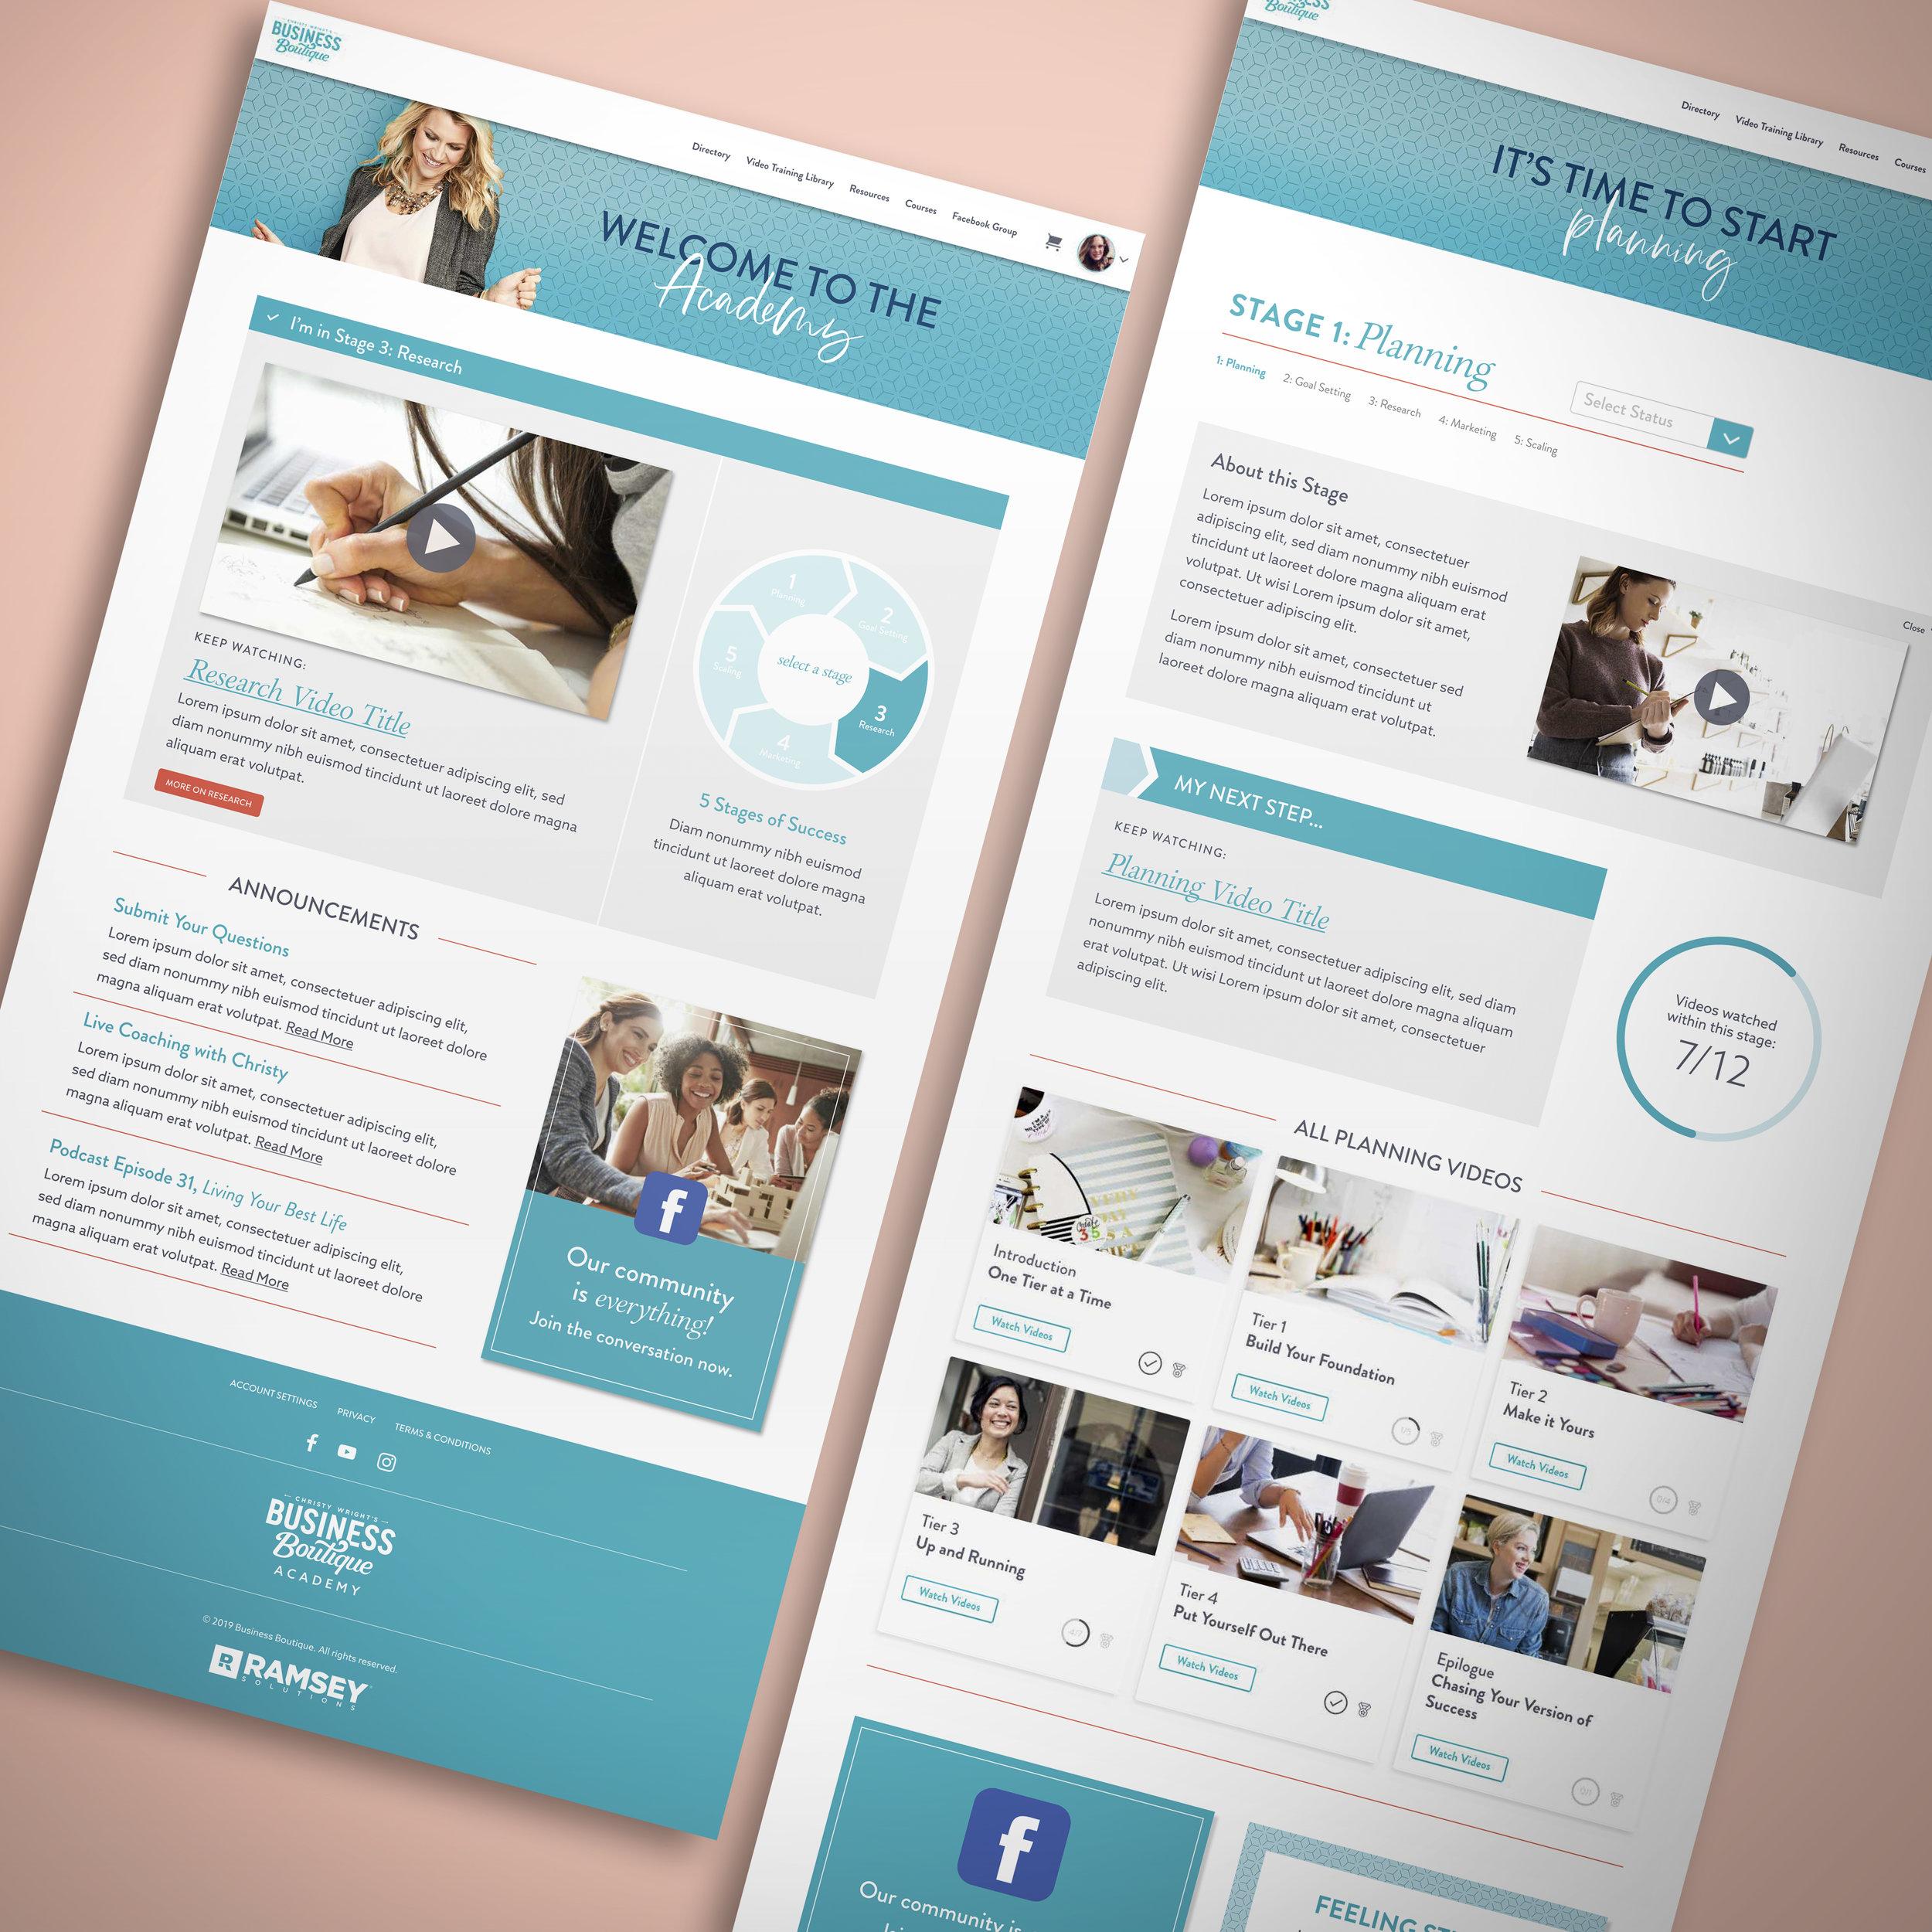 Business Boutique Academy Website